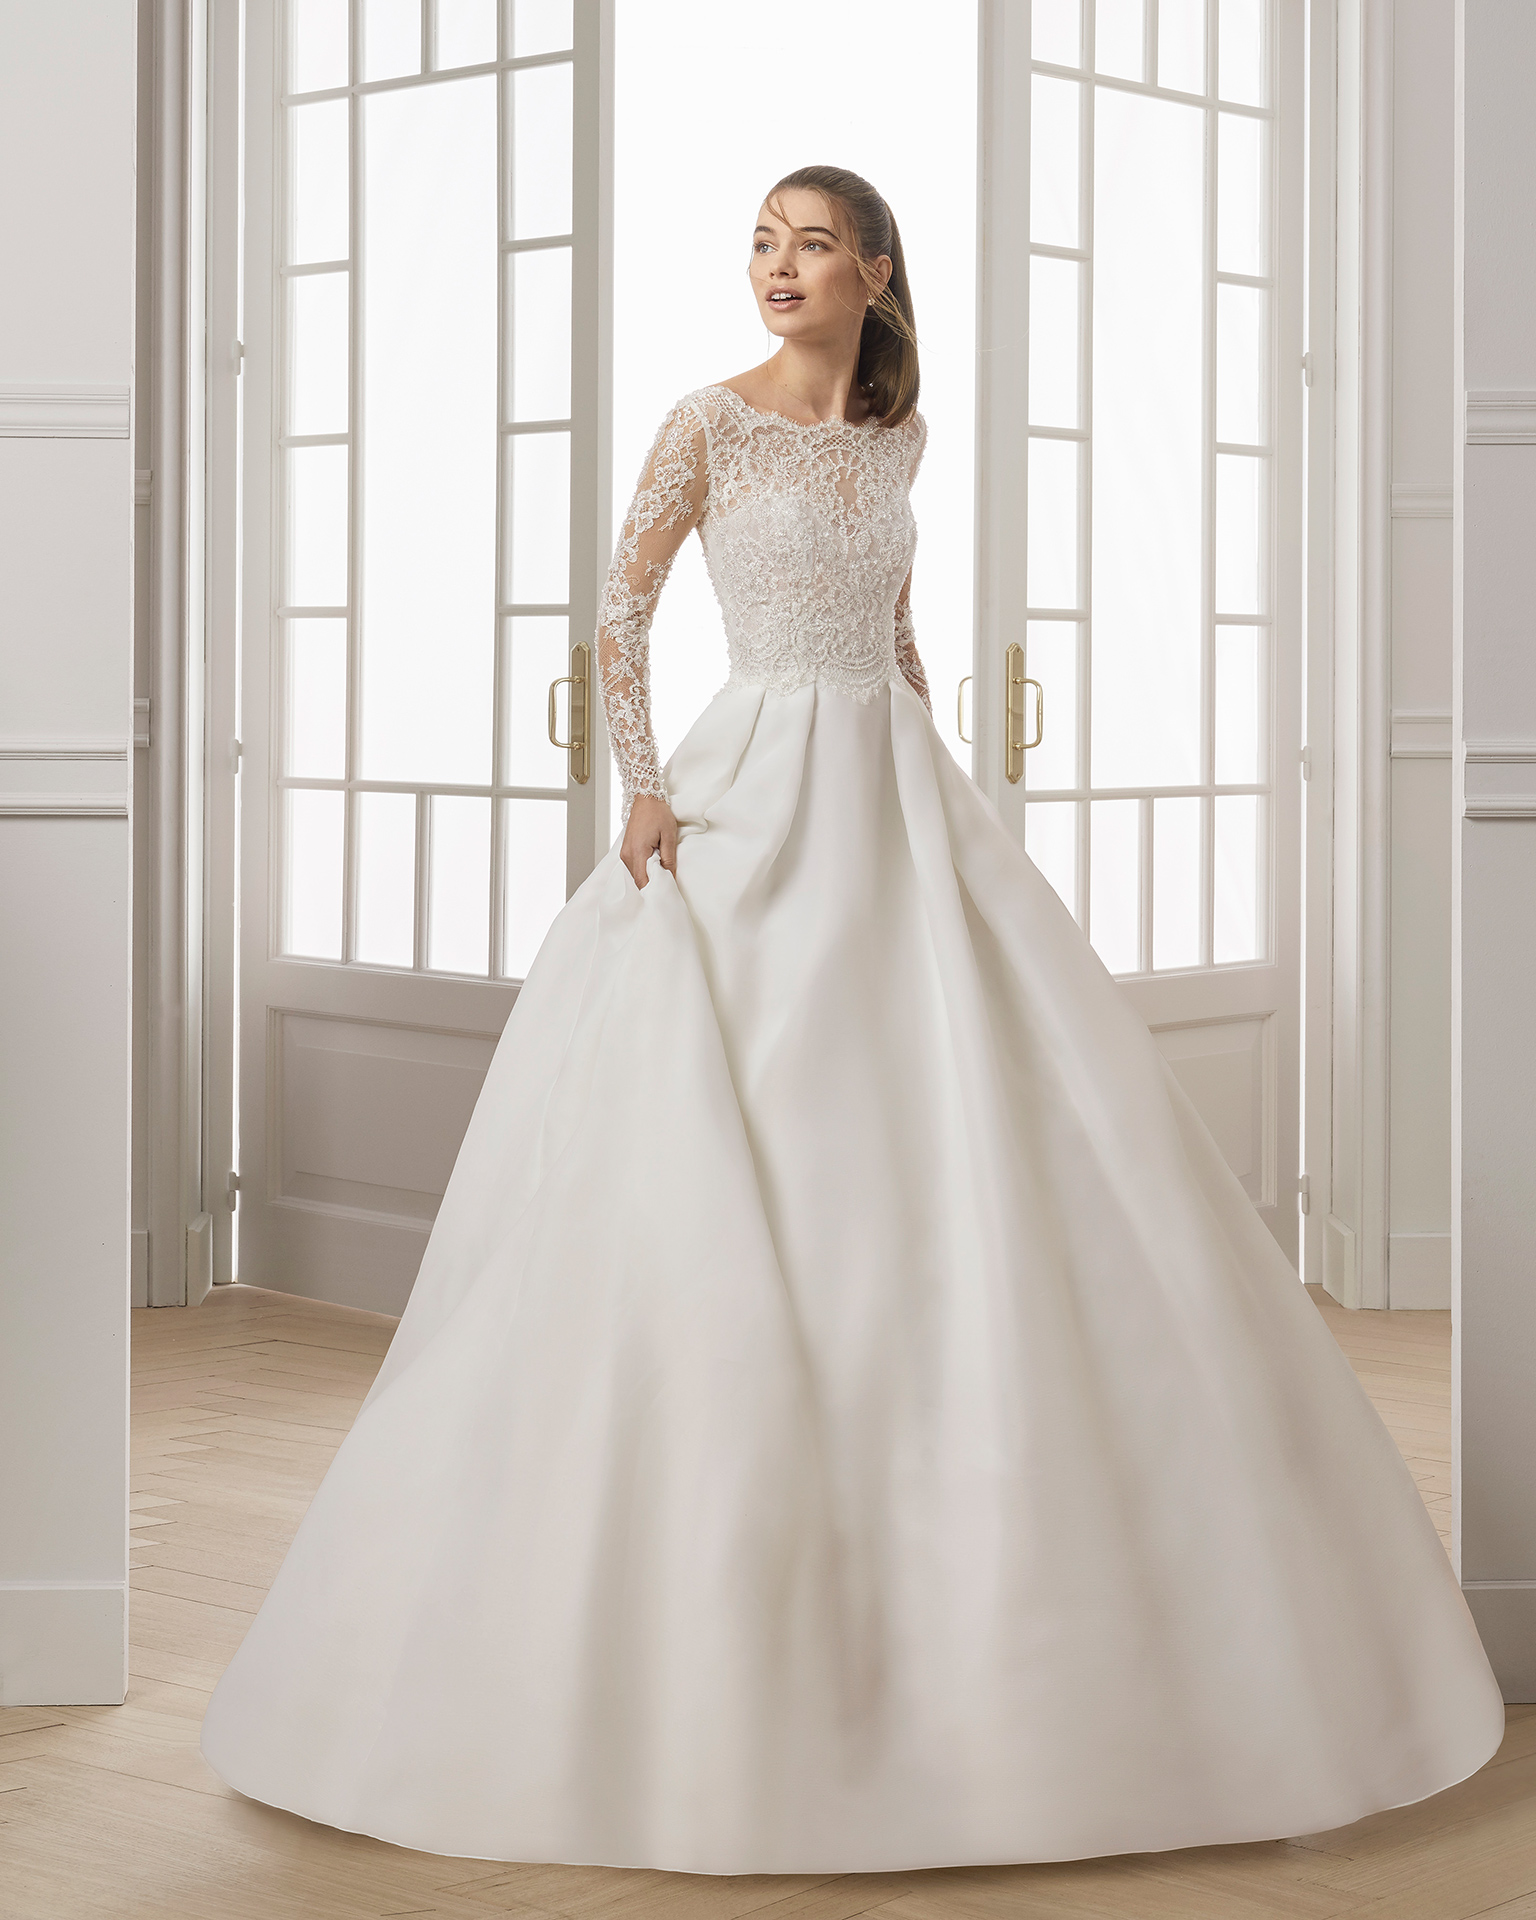 Vestido novia manga larga 2019